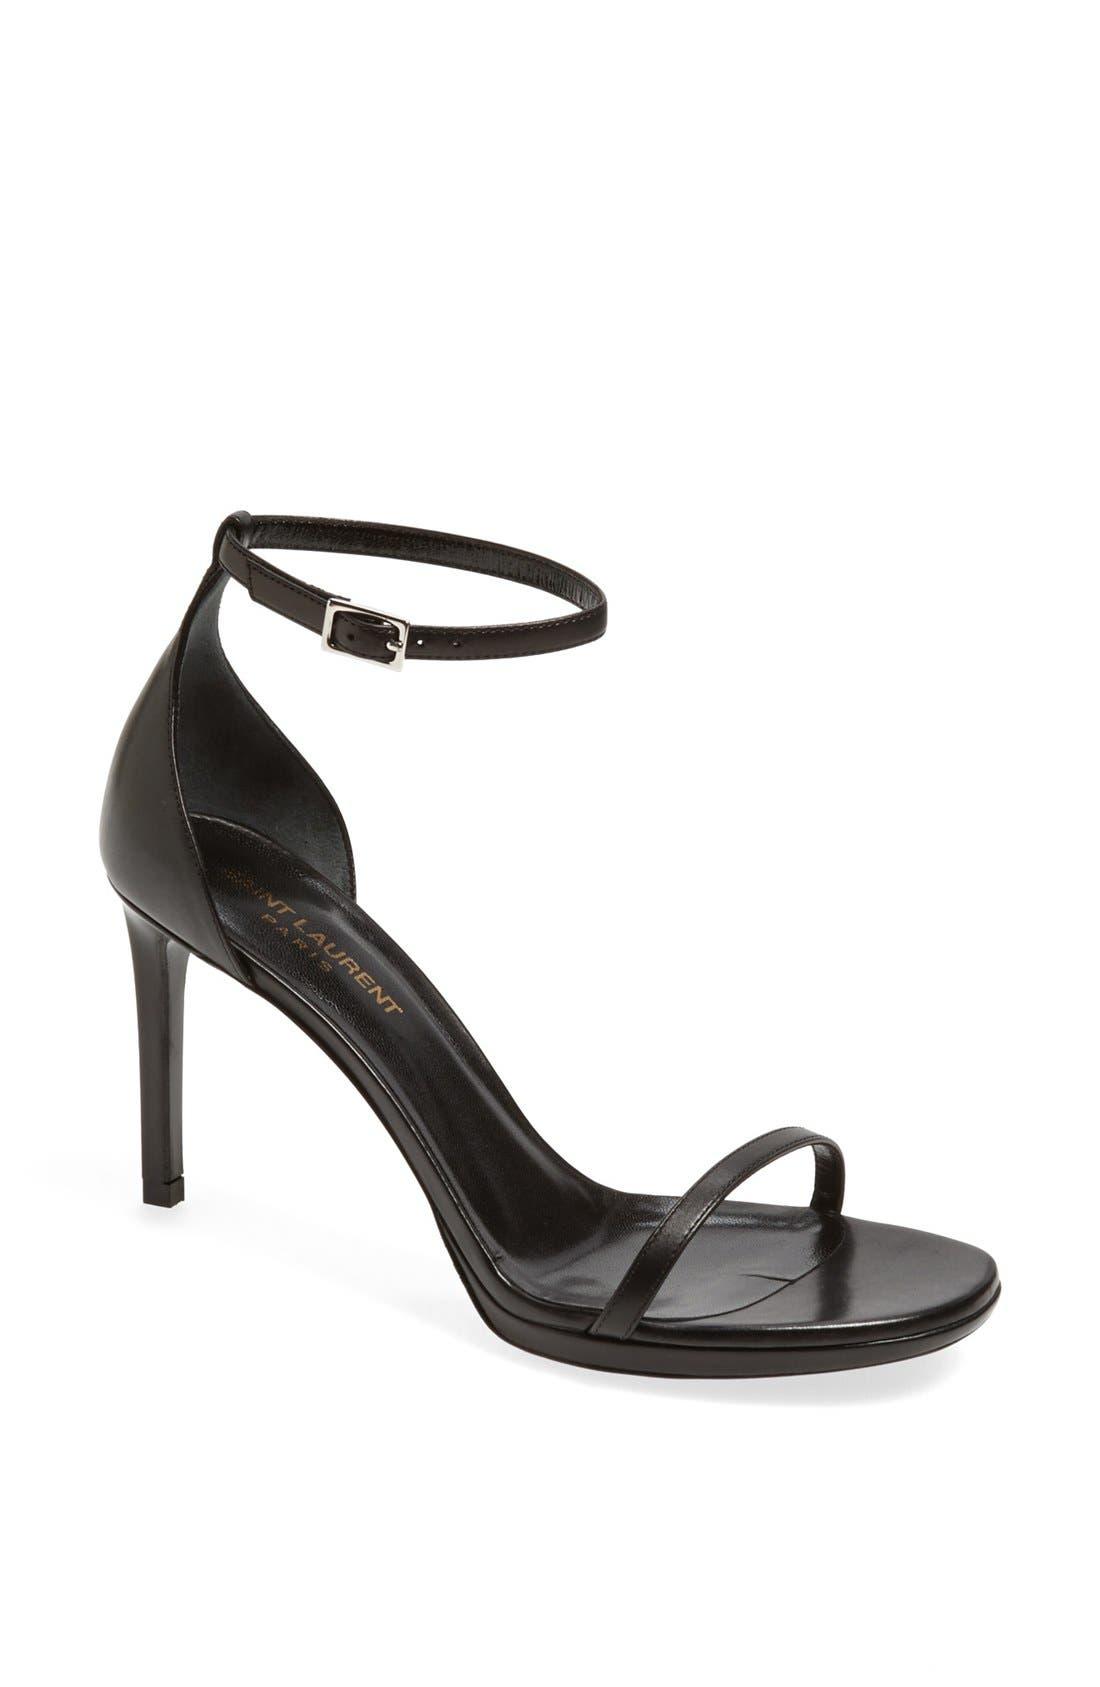 Main Image - Saint Laurent 'Jane' Sandal